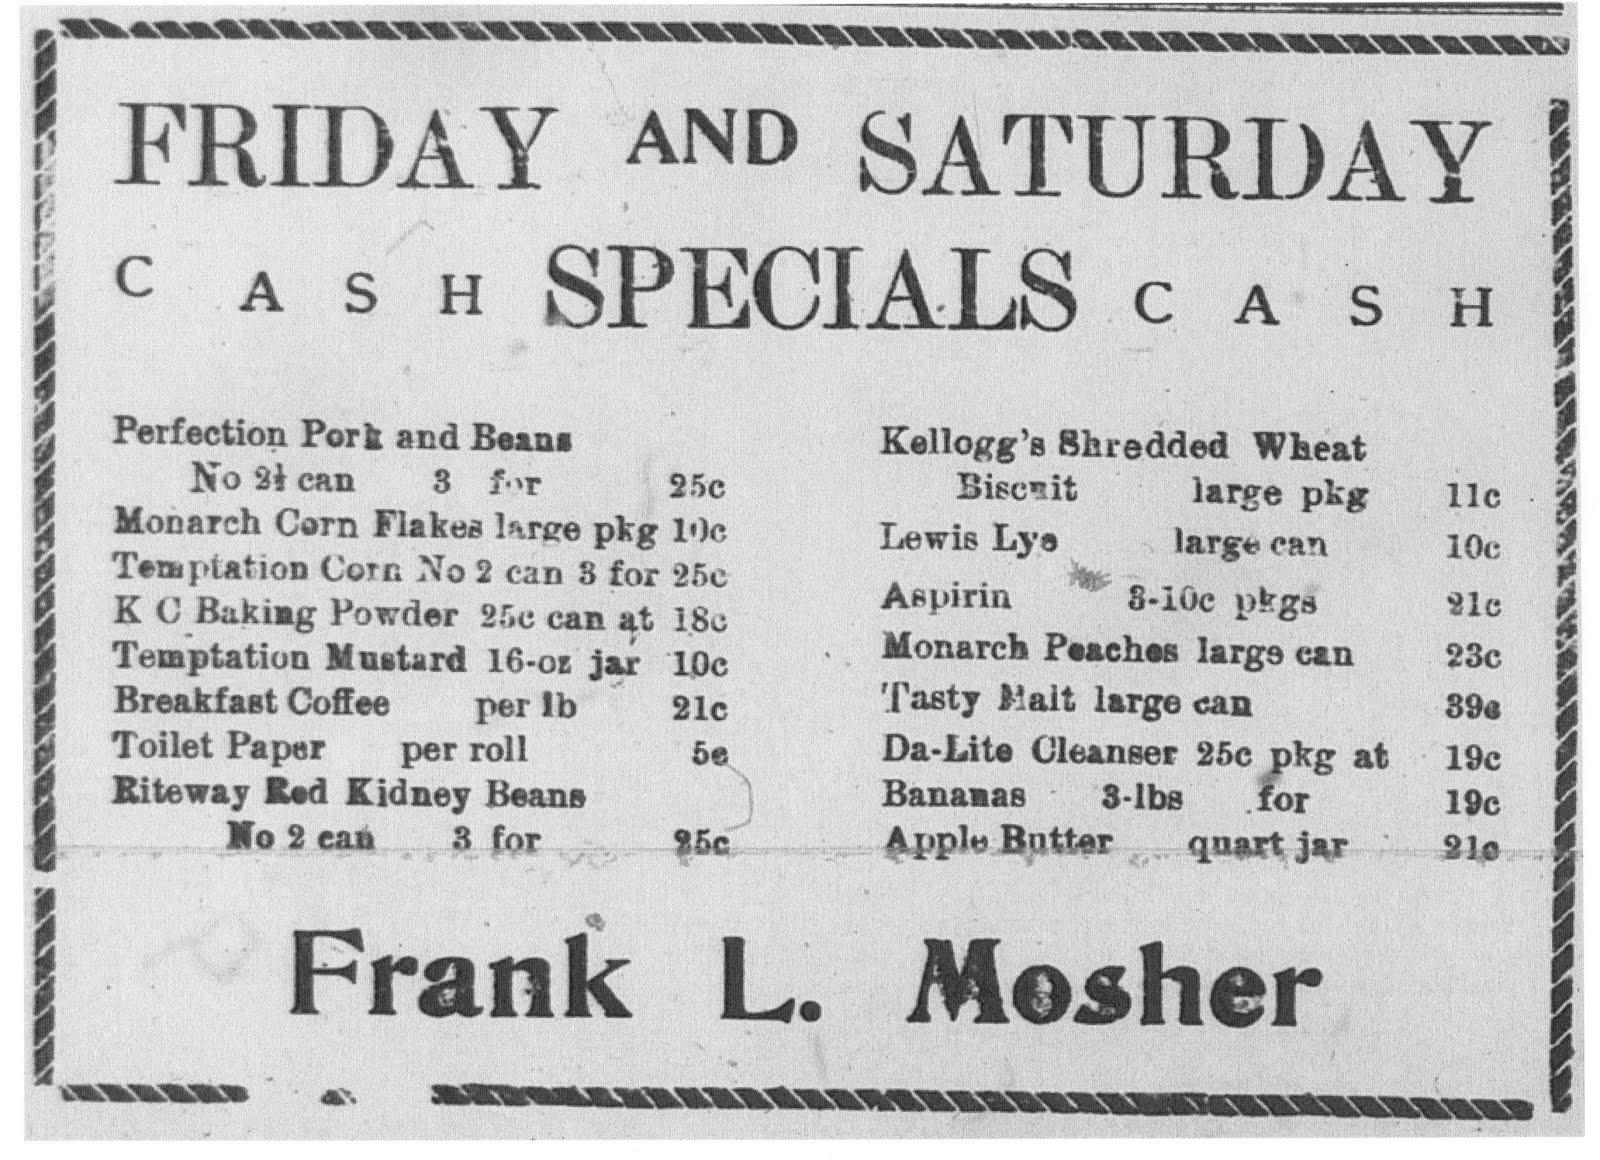 Frank L. Mosher